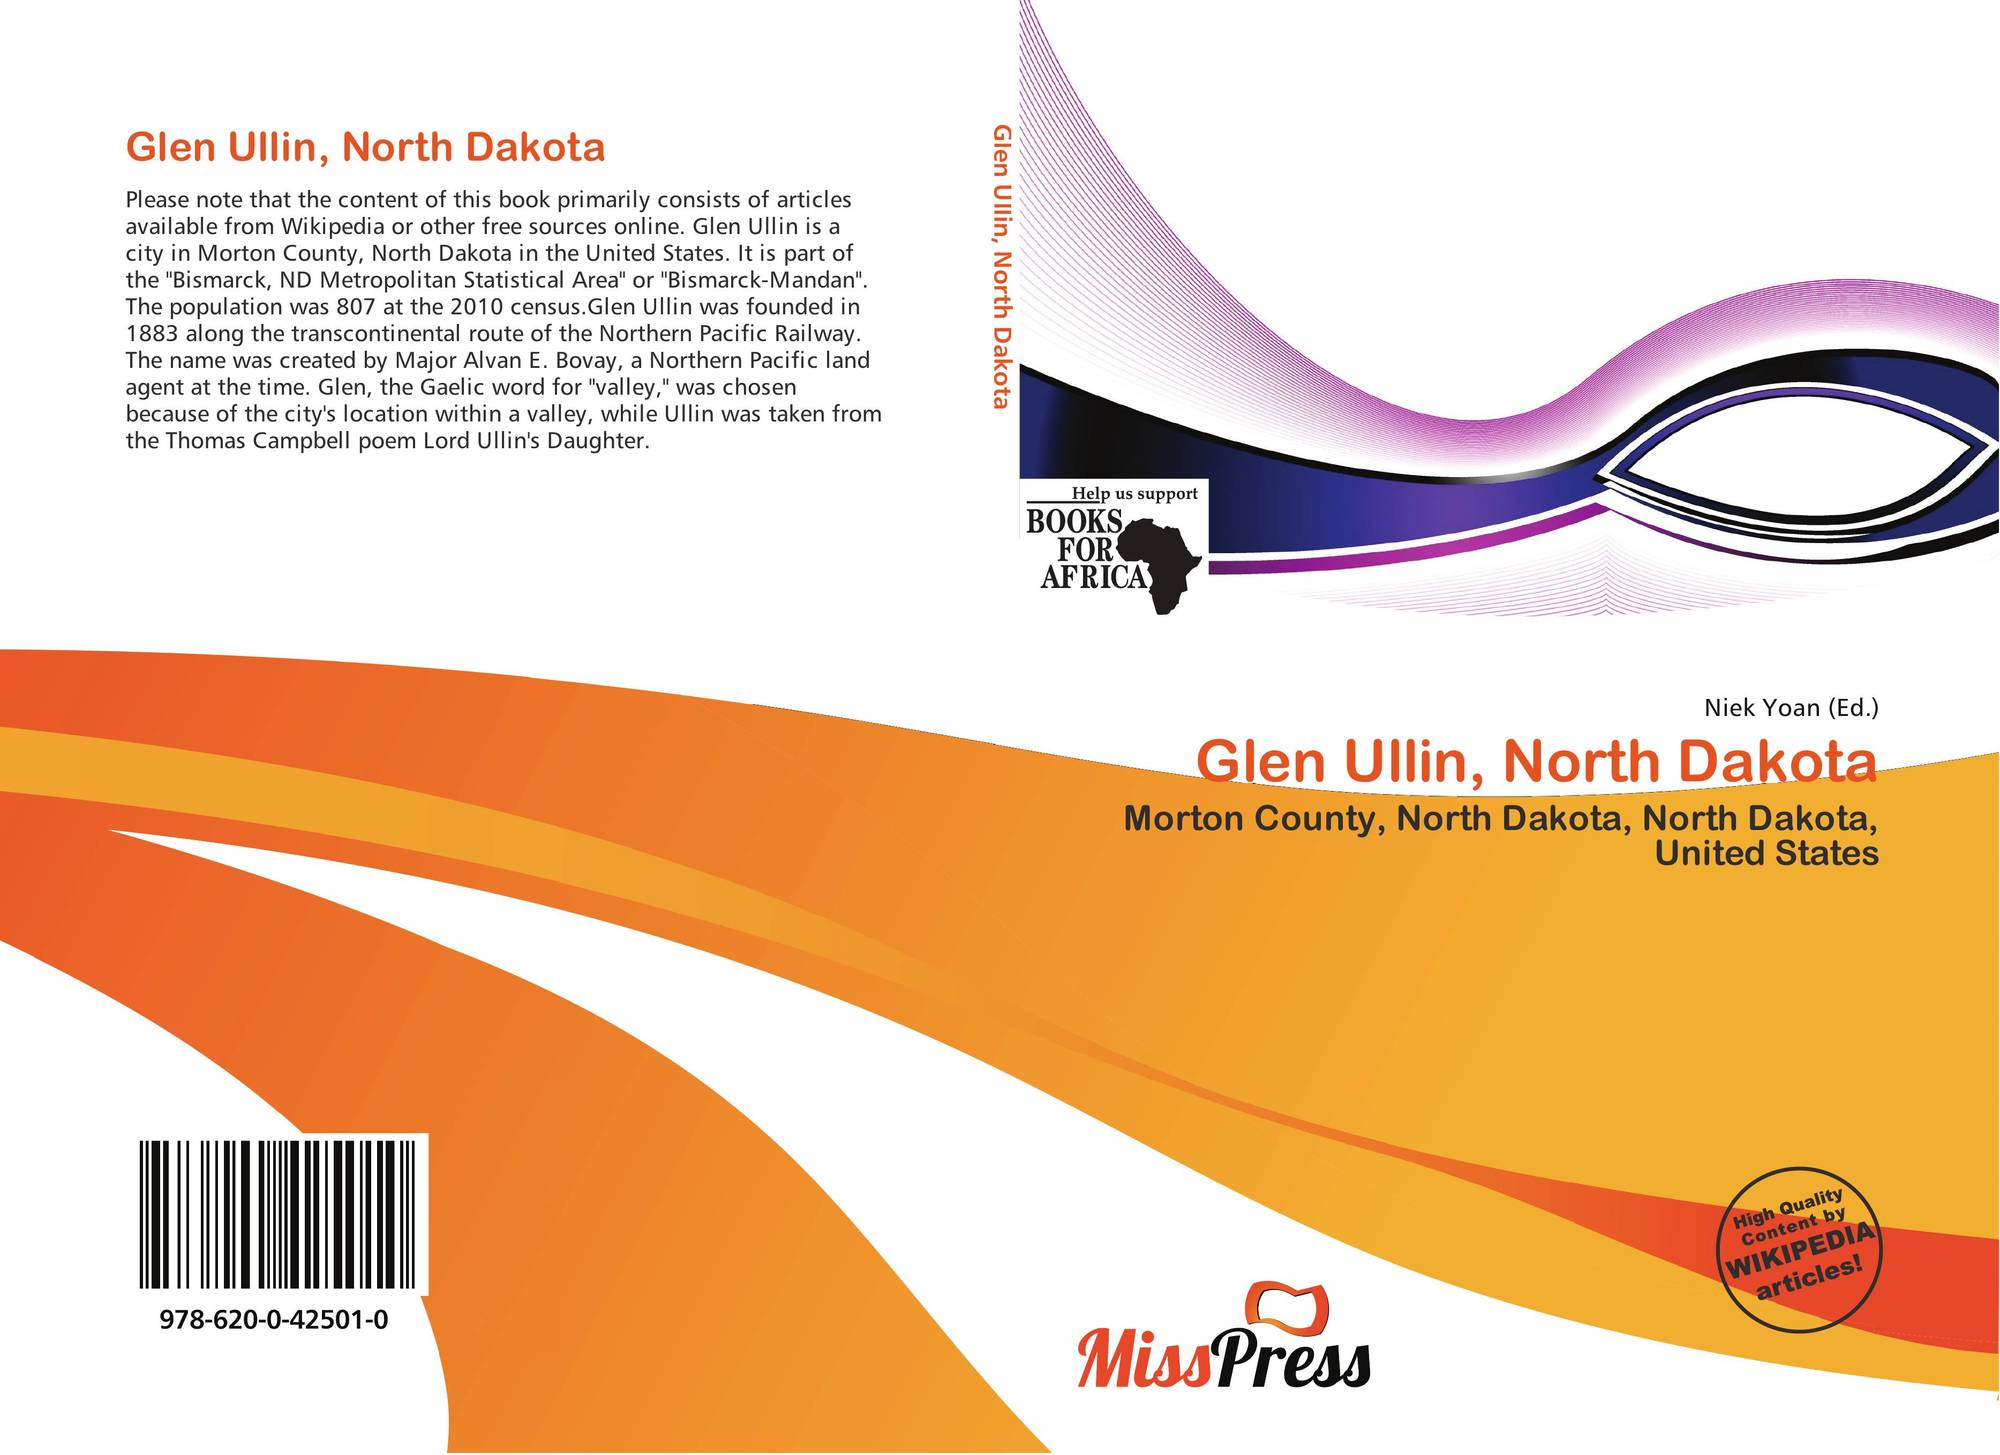 North dakota morton county glen ullin - Bookcover Of Glen Ullin North Dakota